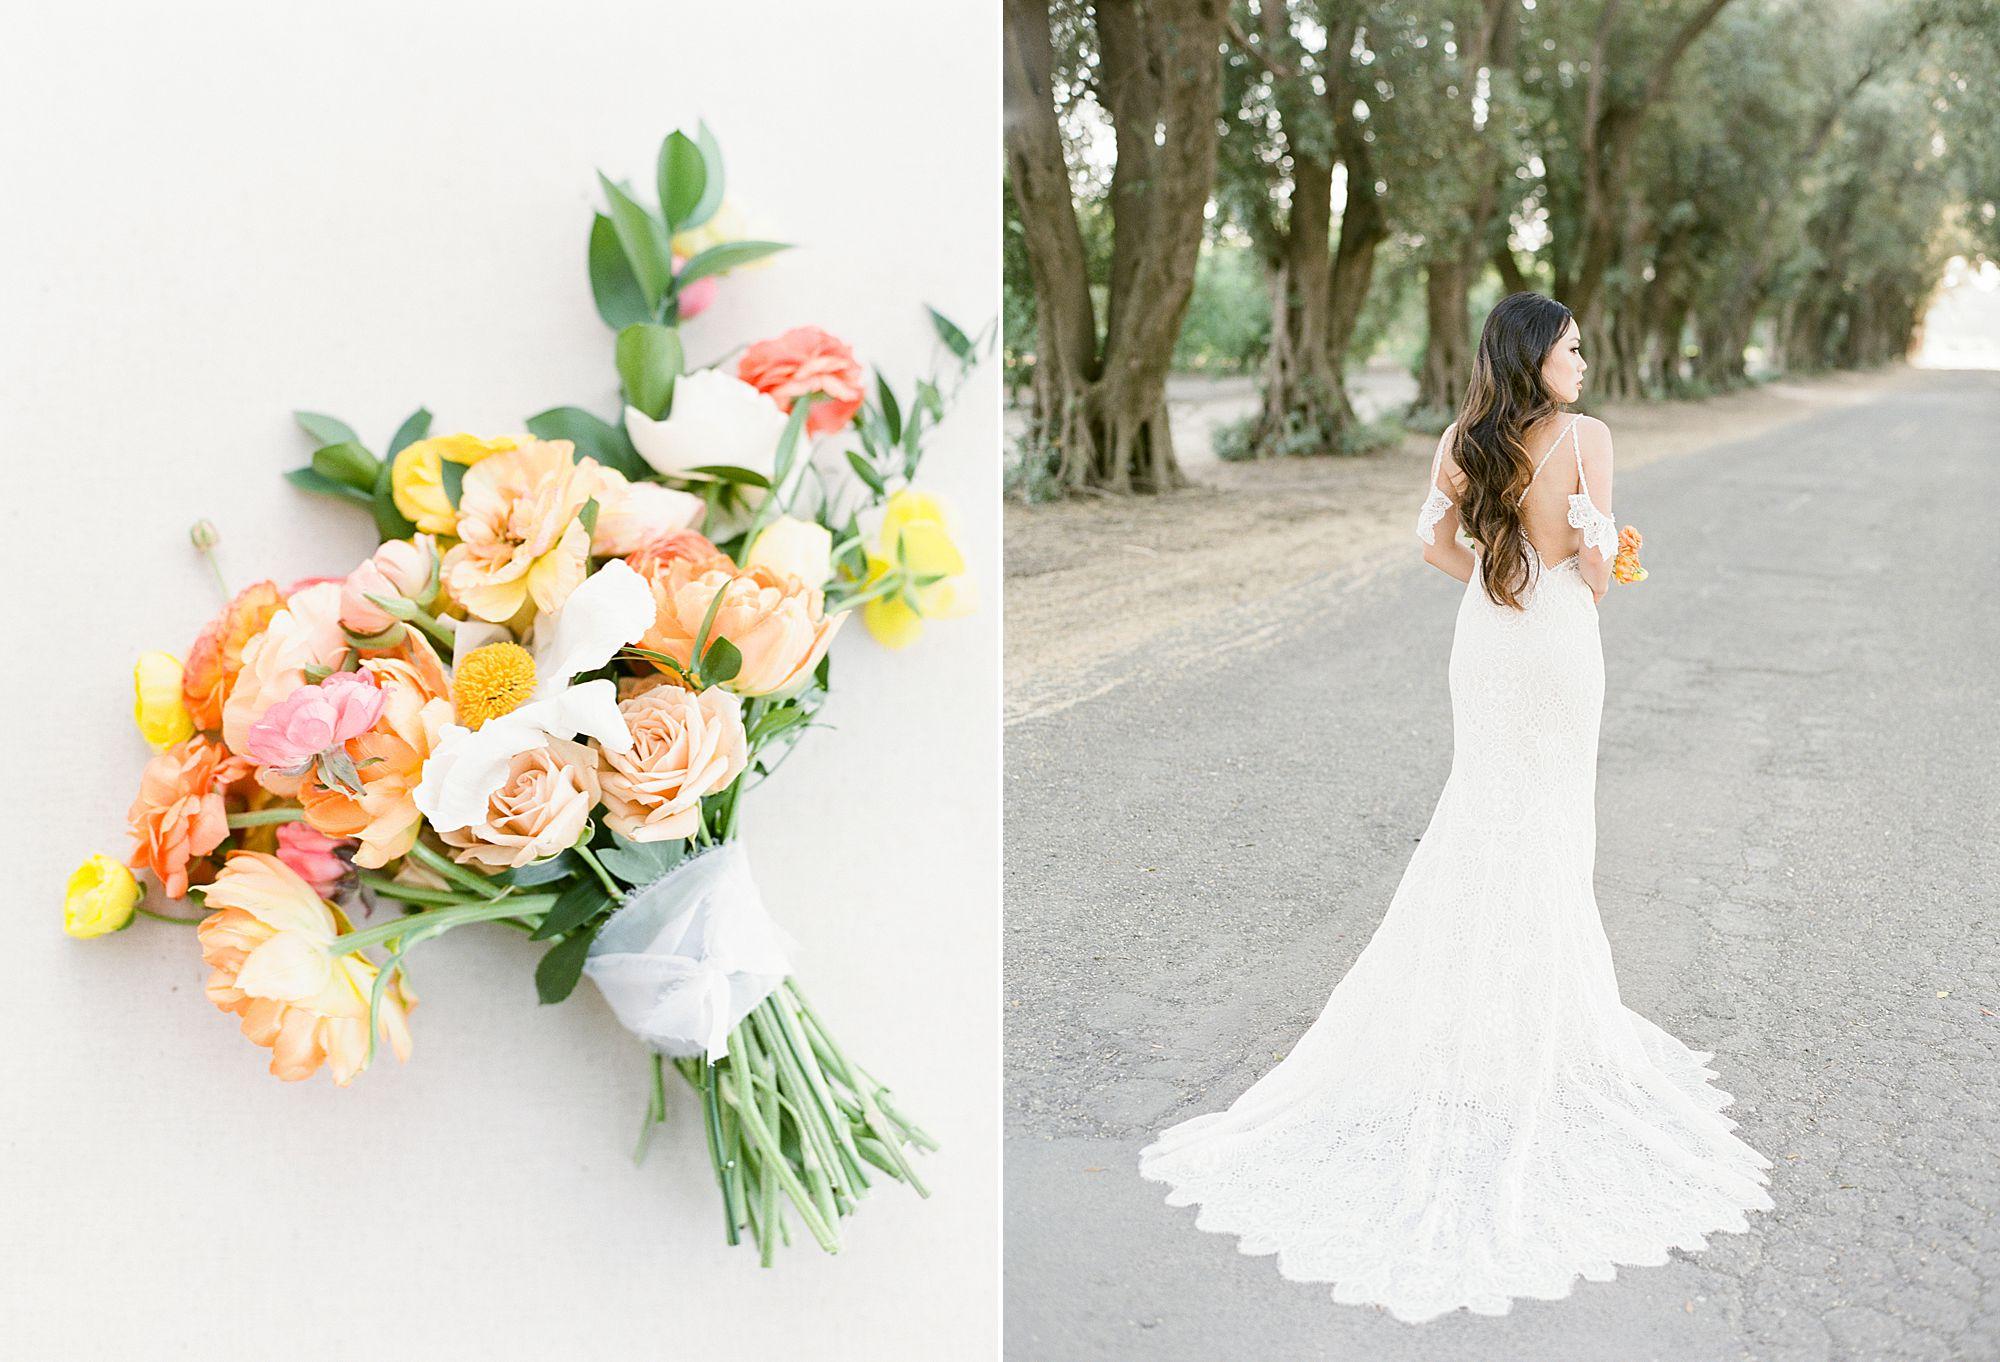 Italian Wedding Inspiration at The Maples Wedding & Event Center - Featured on Wedding Chicks - Ashley Baumgartner - Sacramento Wedding Phtoographer_0028.jpg